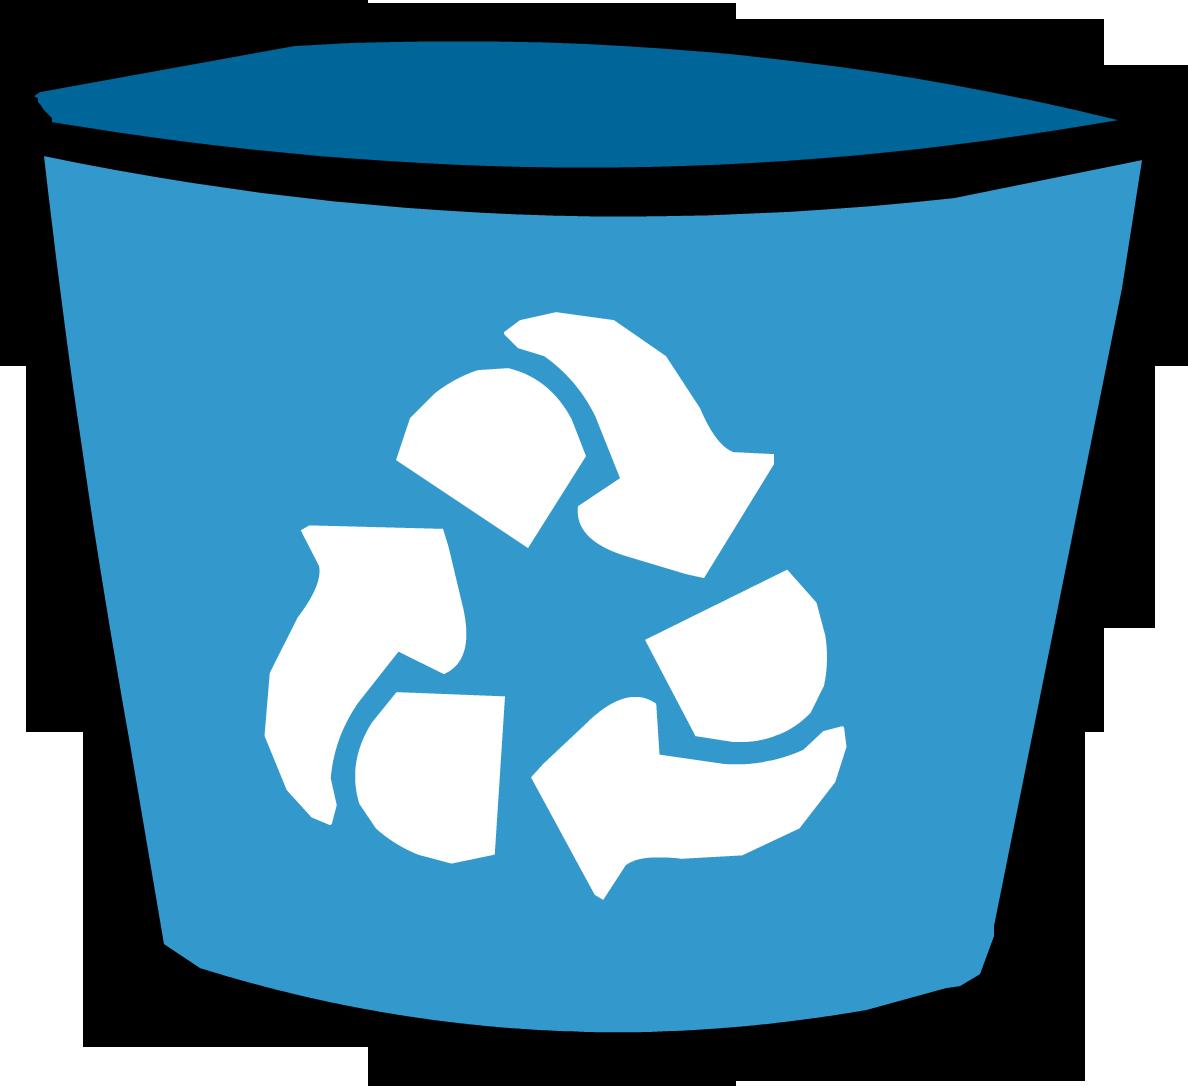 Recycle Bin | Club Penguin Wiki | Fandom powered by Wikia